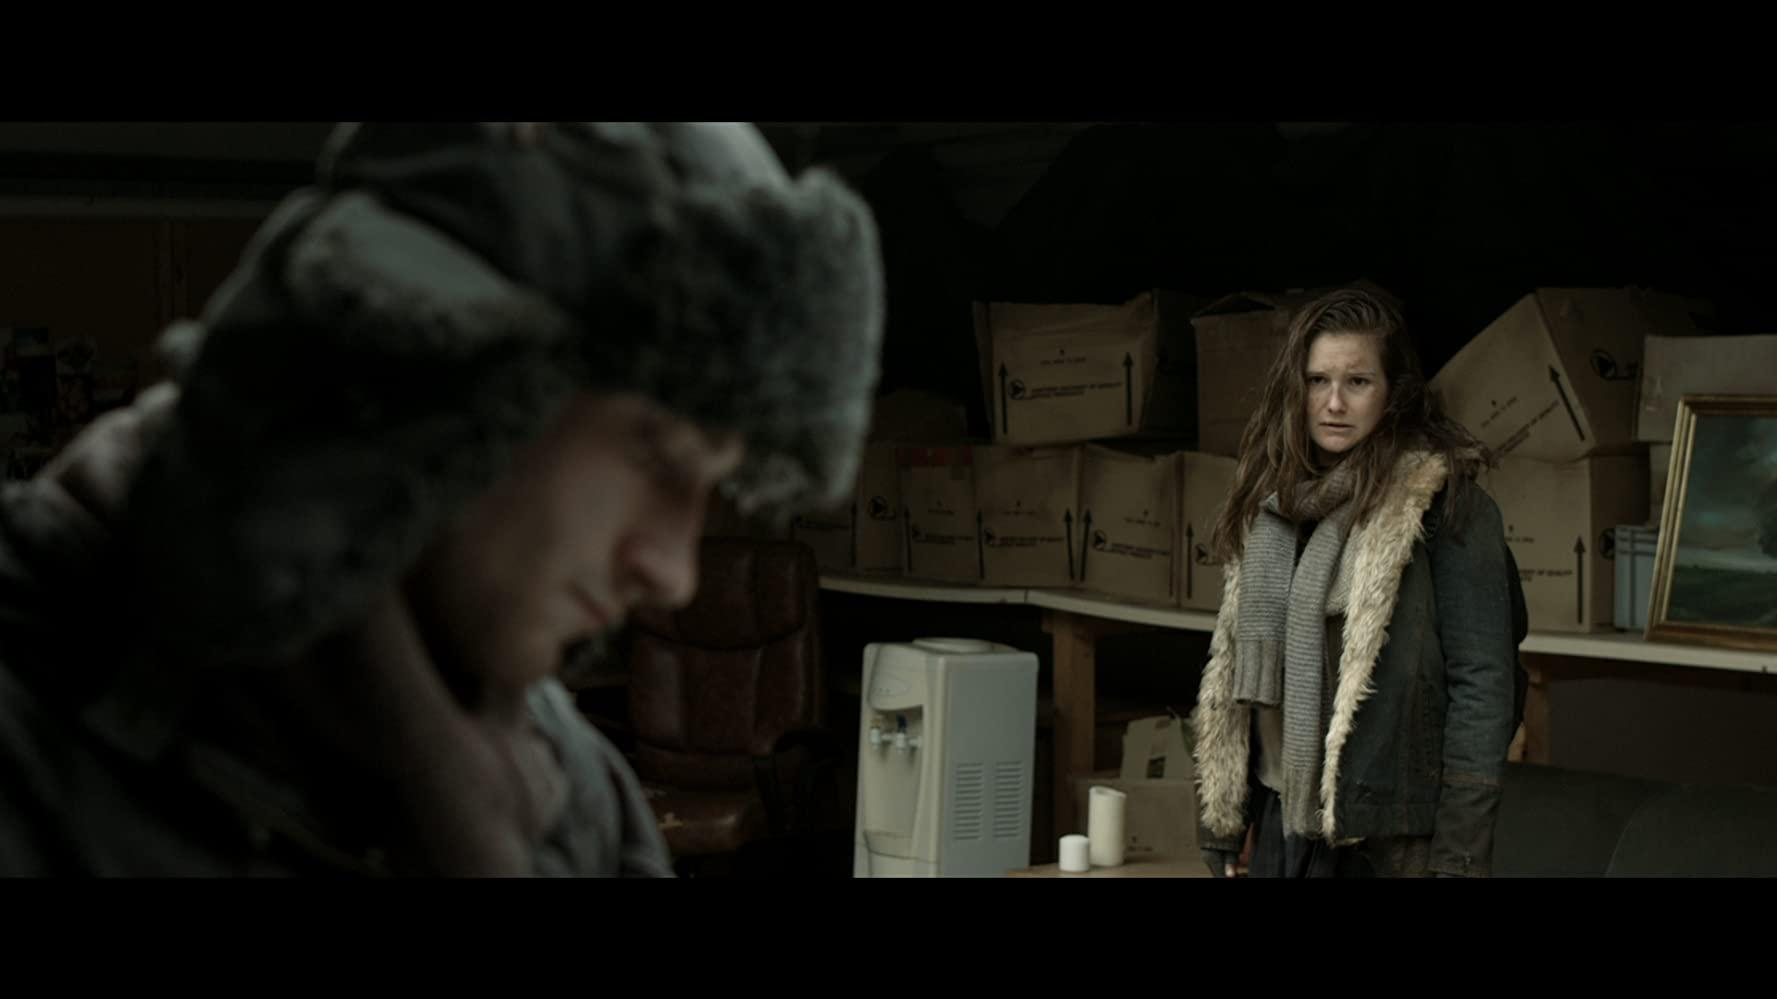 مشاهدة فيلم Edge Of Extinction (2020) مترجم HD اون لاين